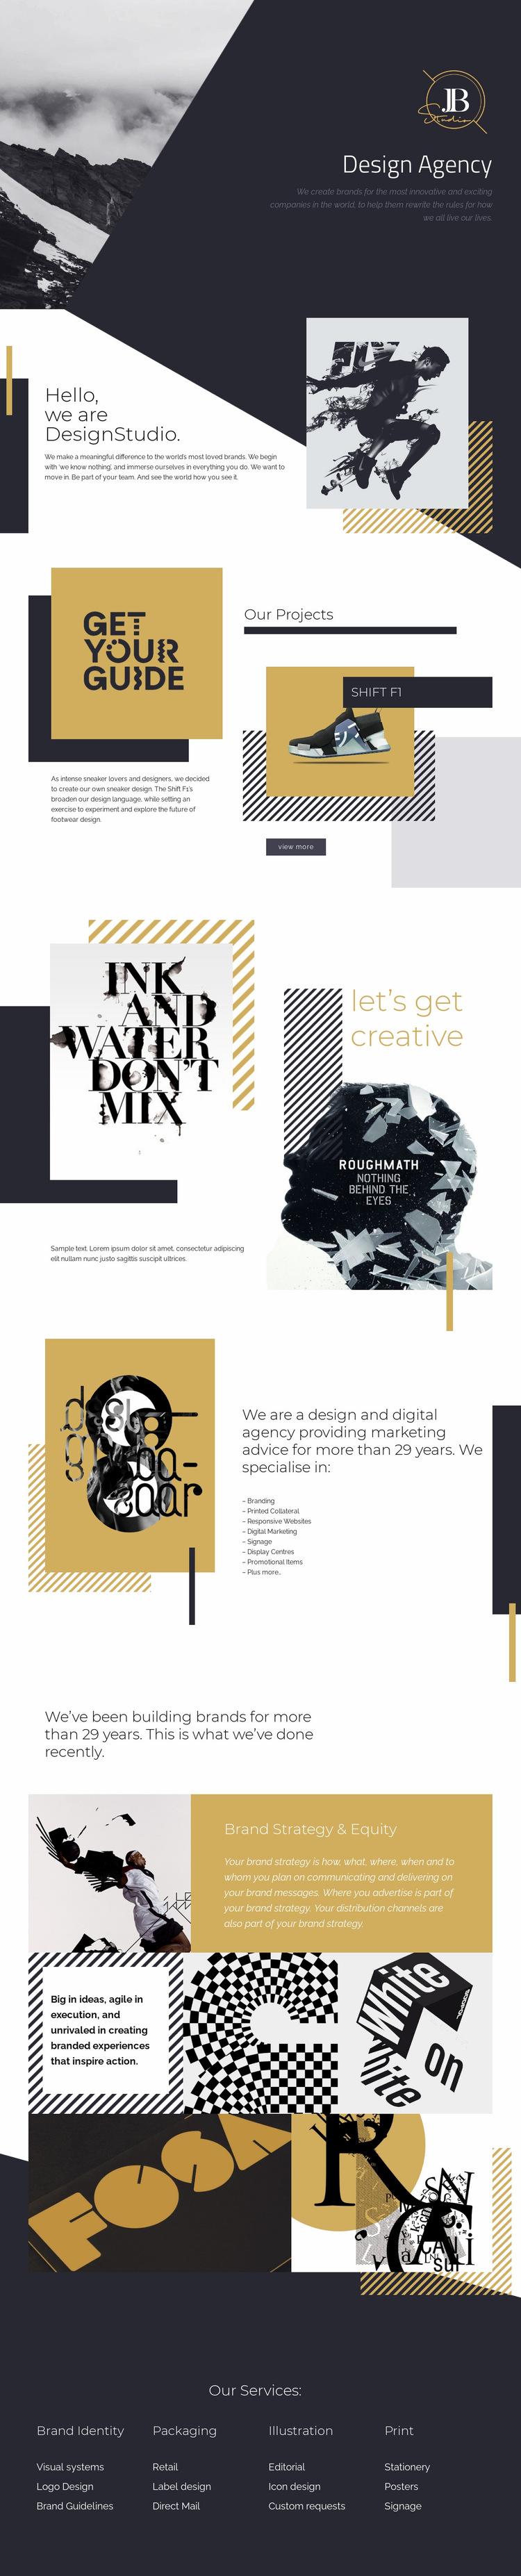 We create amazing websites Web Page Design